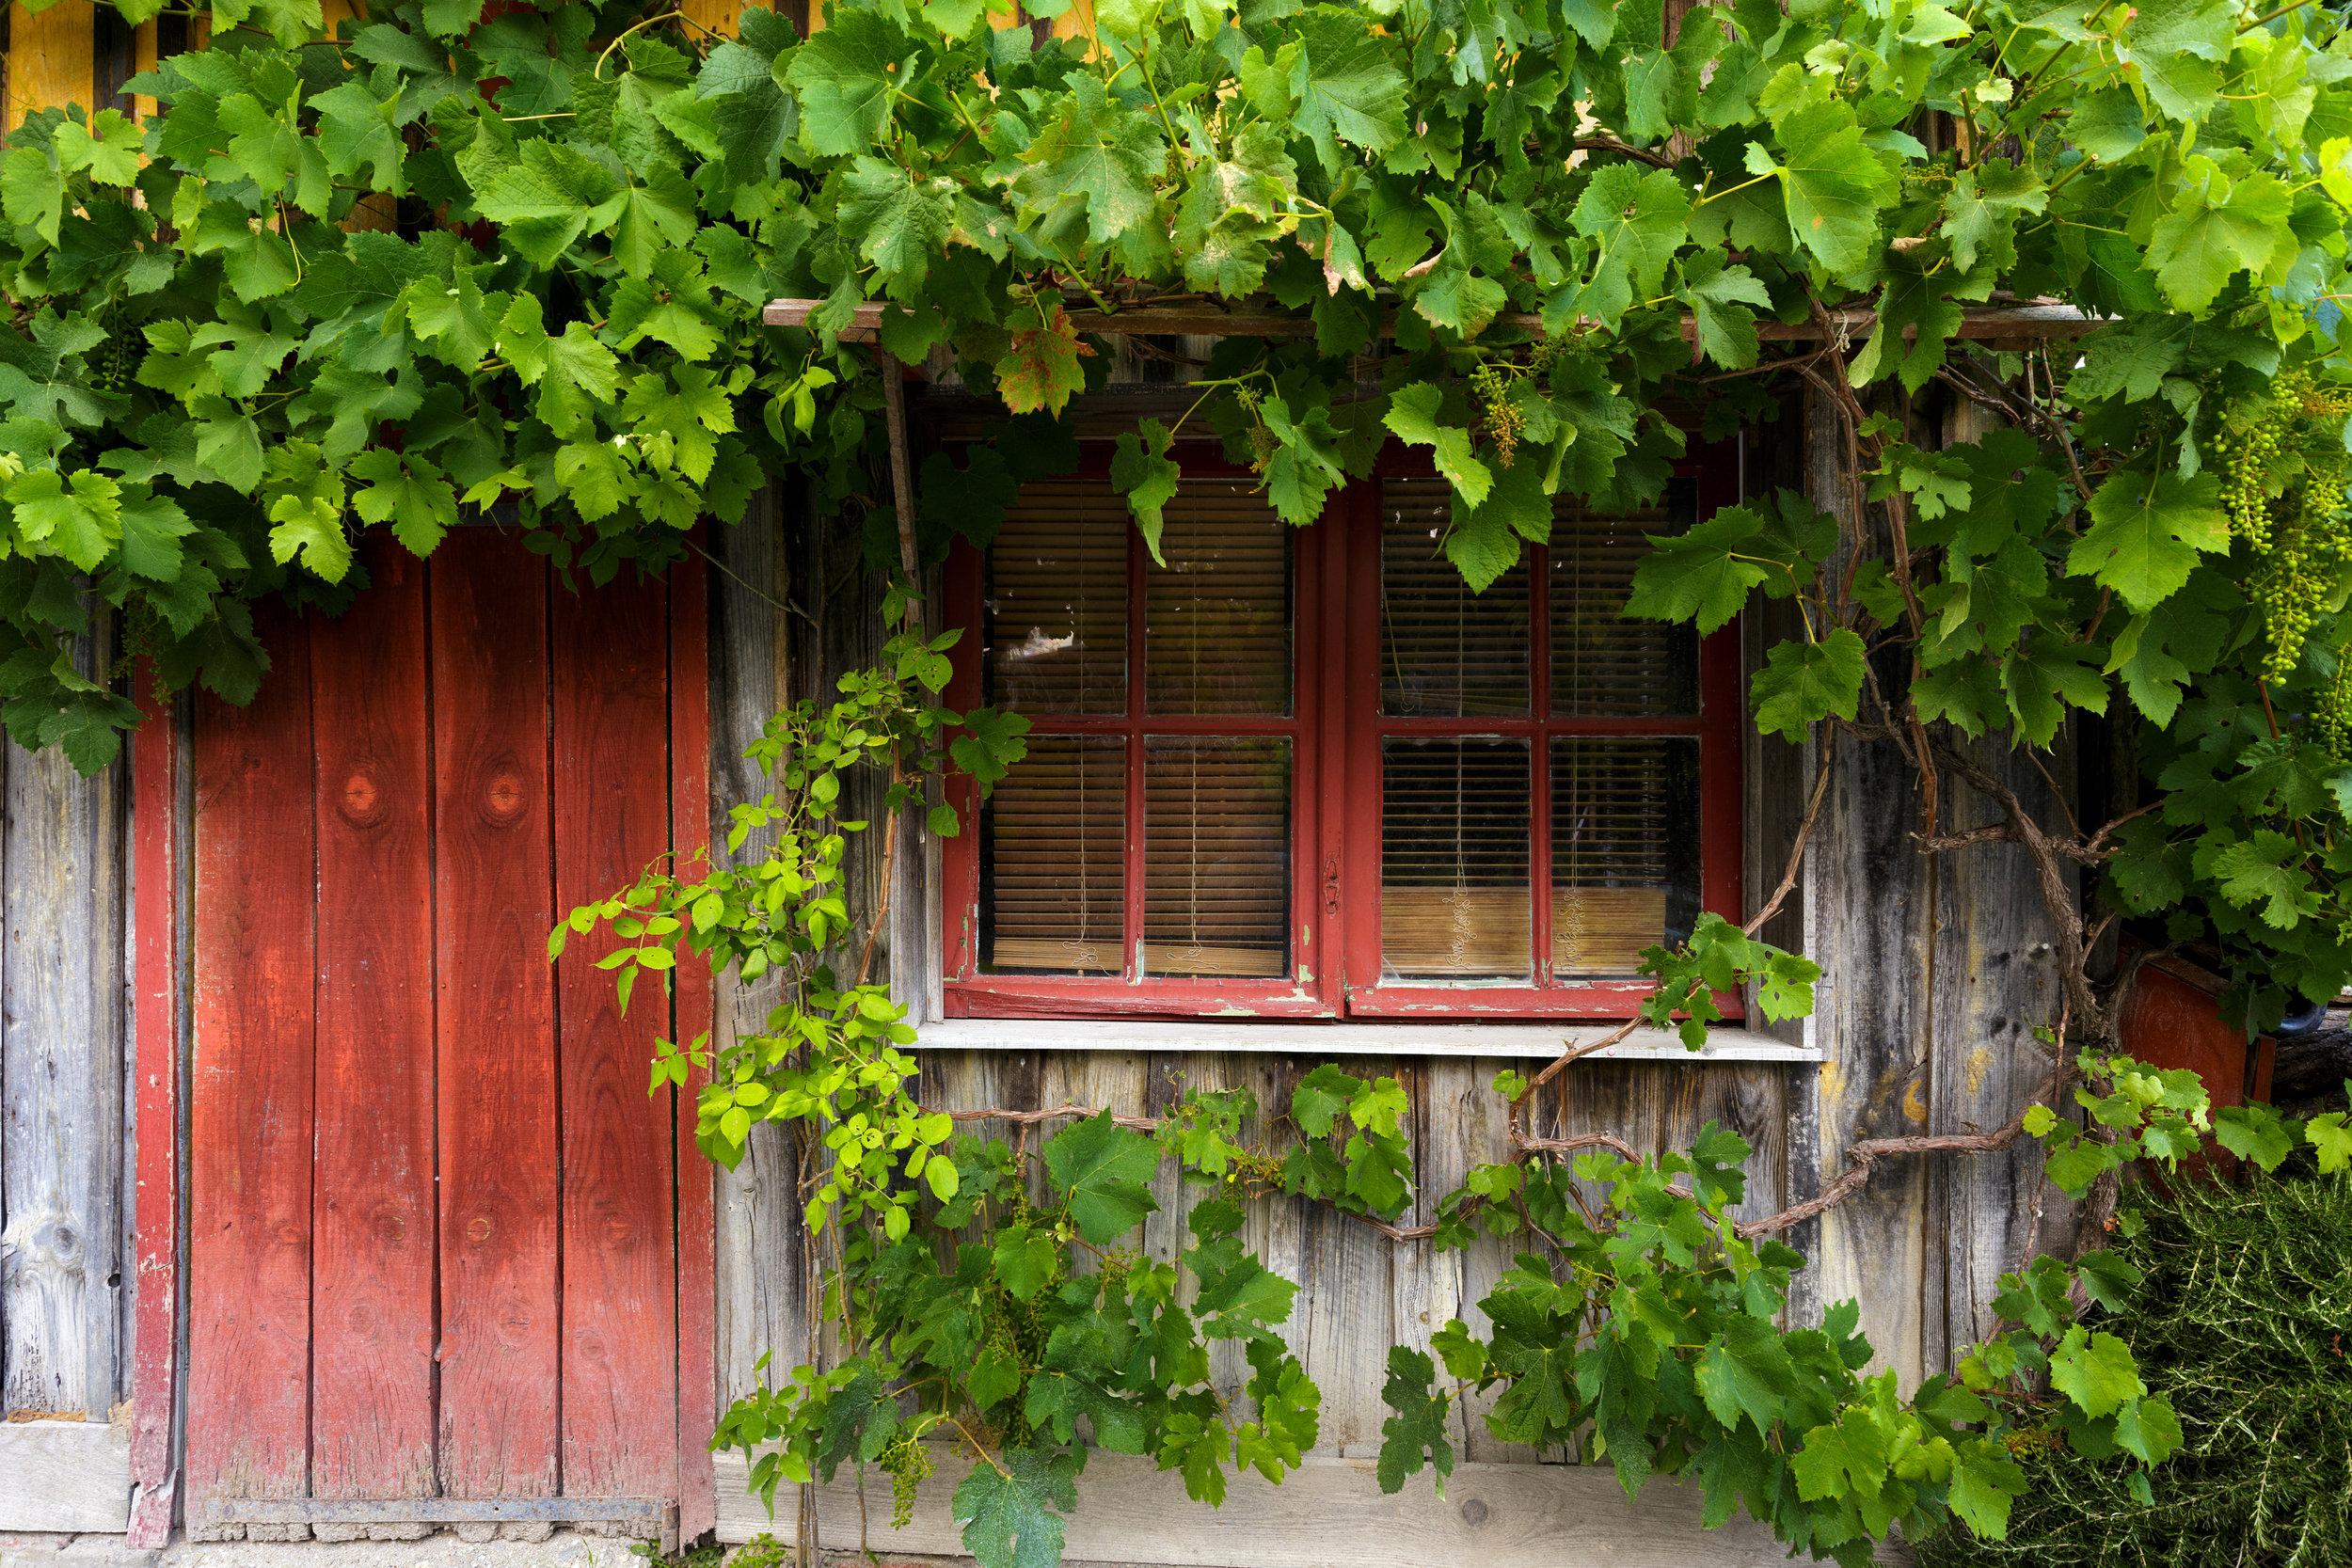 bordeaux_bigstock-Grapevine-climbing-on-ancient--158218802.jpg